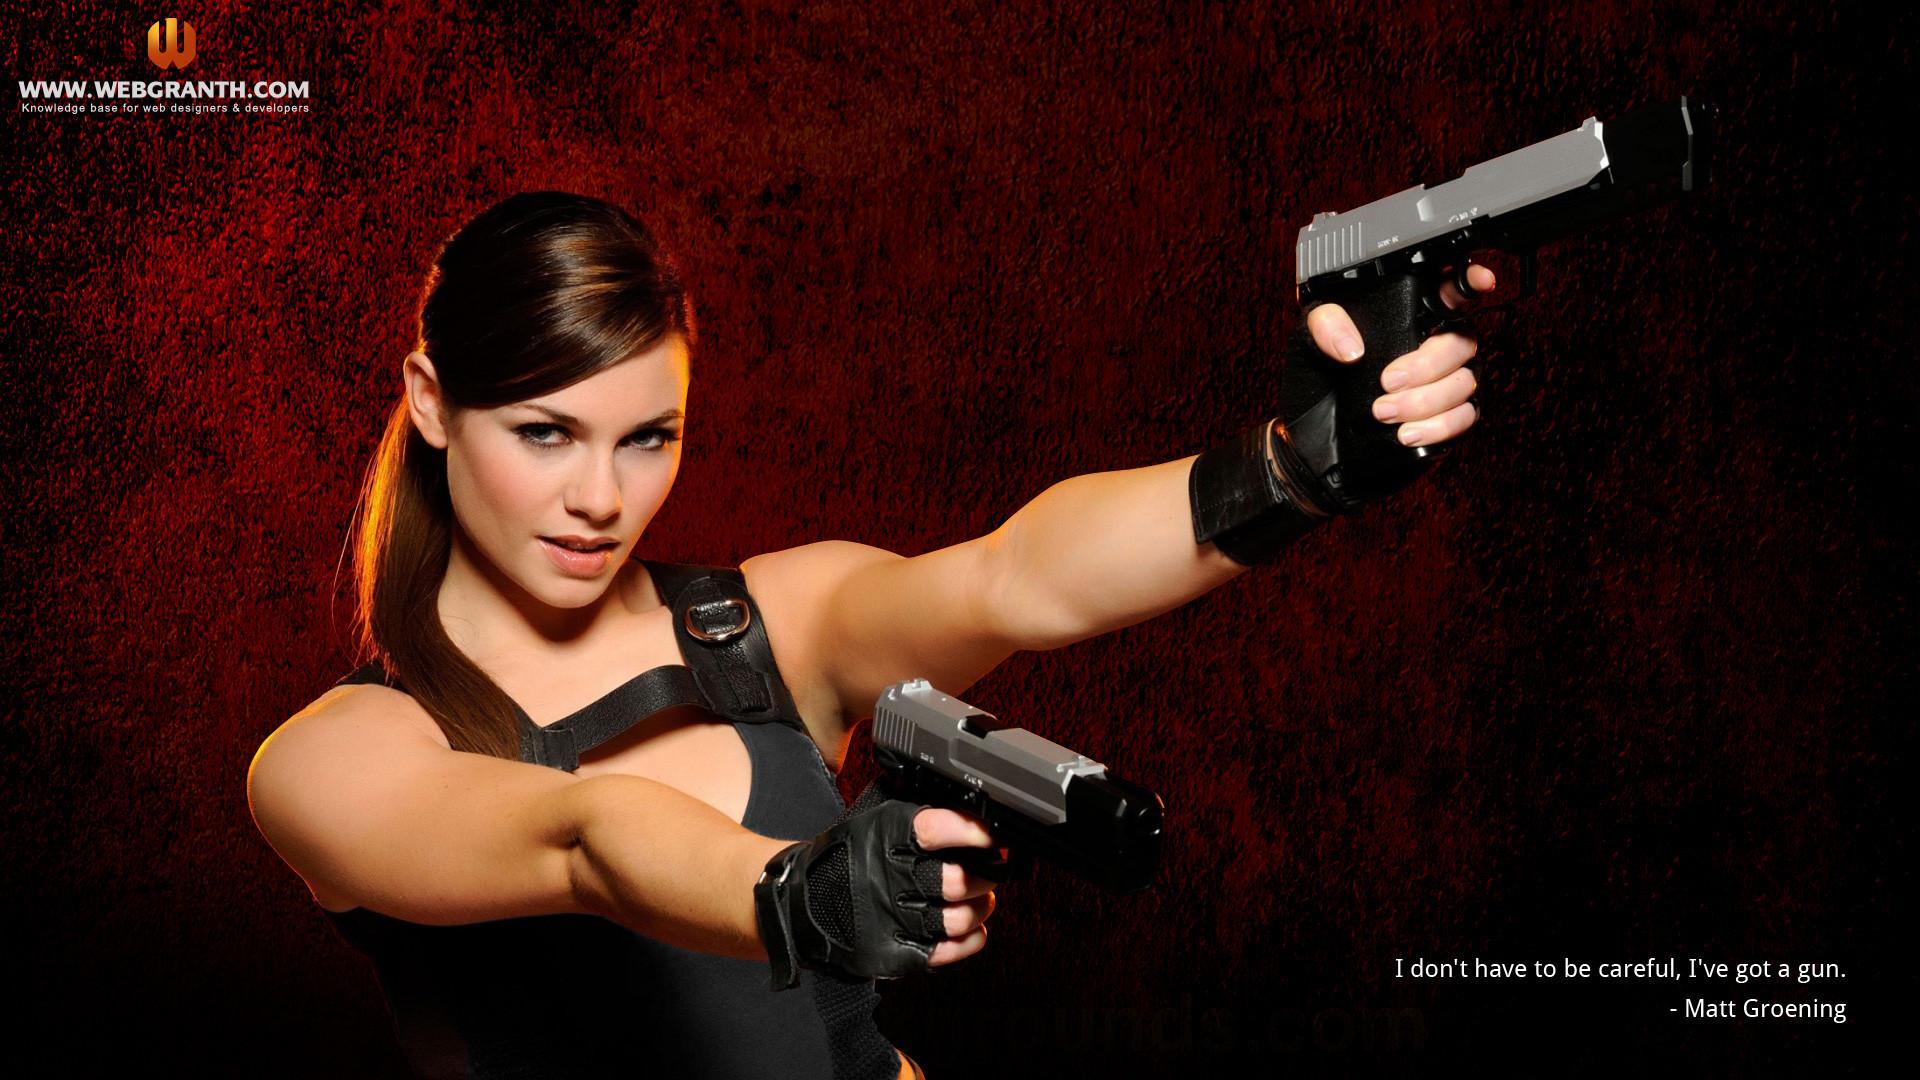 Guns Wallpaper: Download HD Guns & Weapons Wallpapers – Webgranth 2015 .